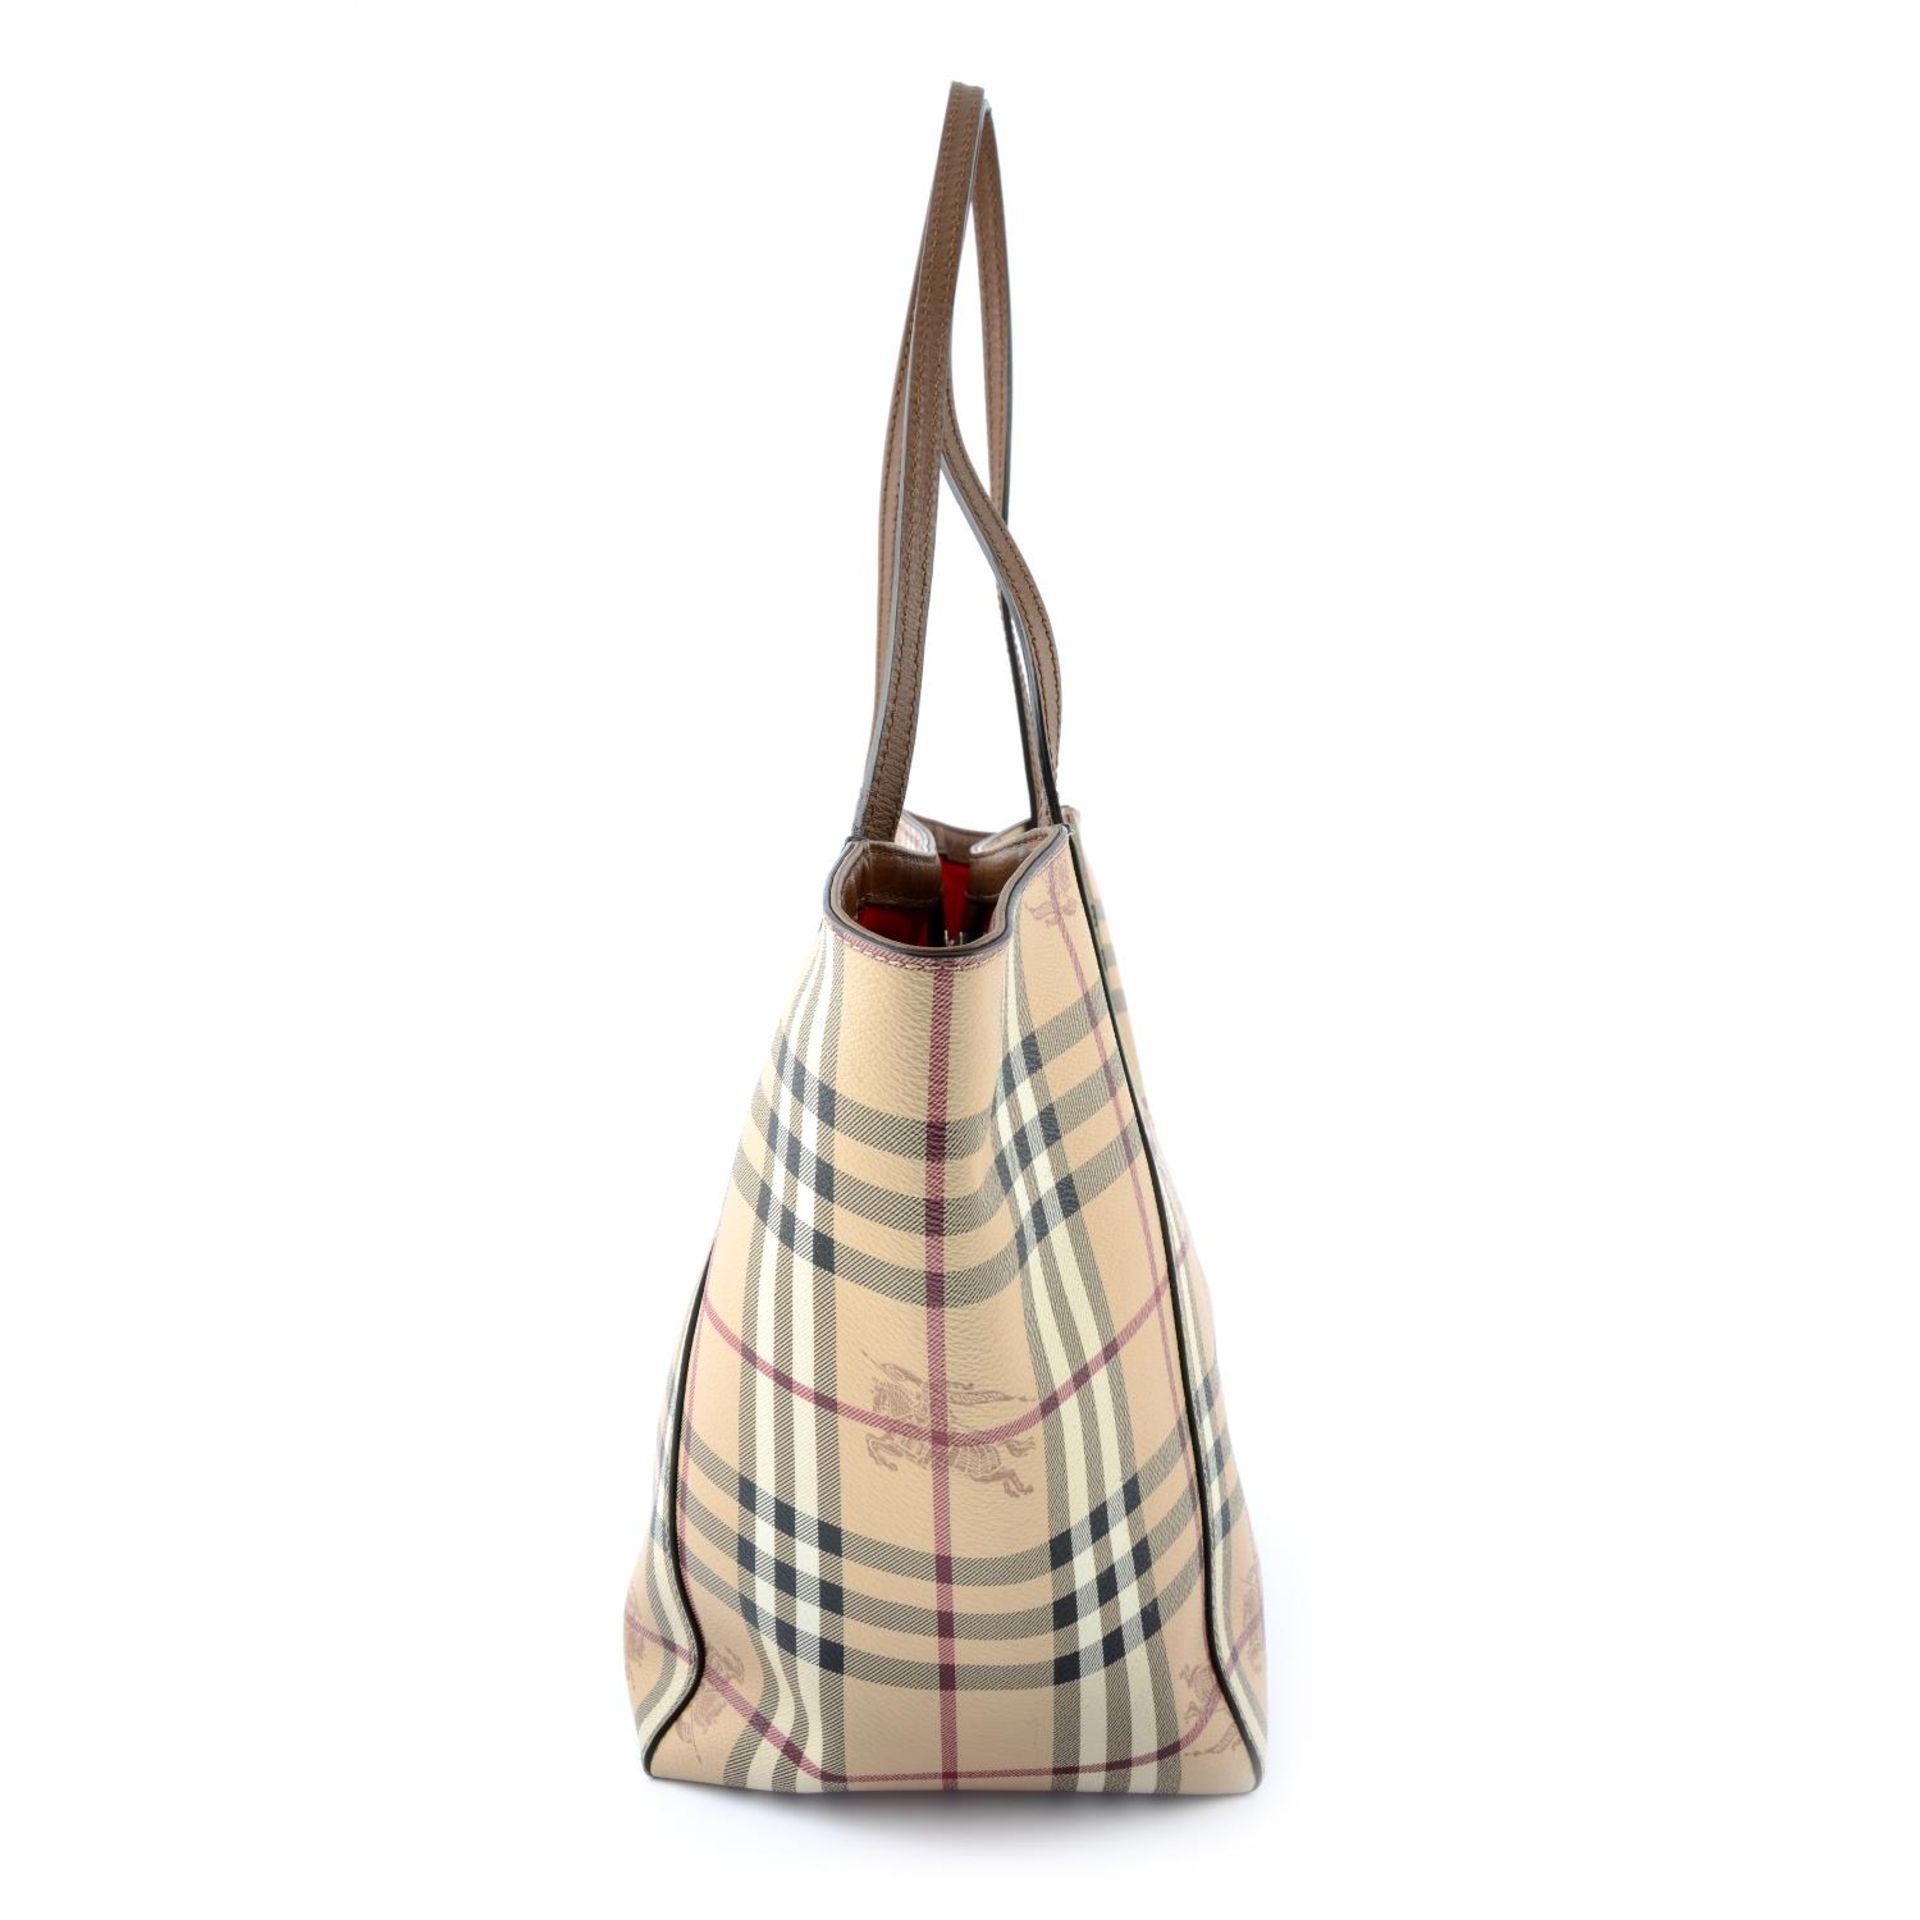 BURBERRY - a Haymarket Check handbag. - Image 3 of 4